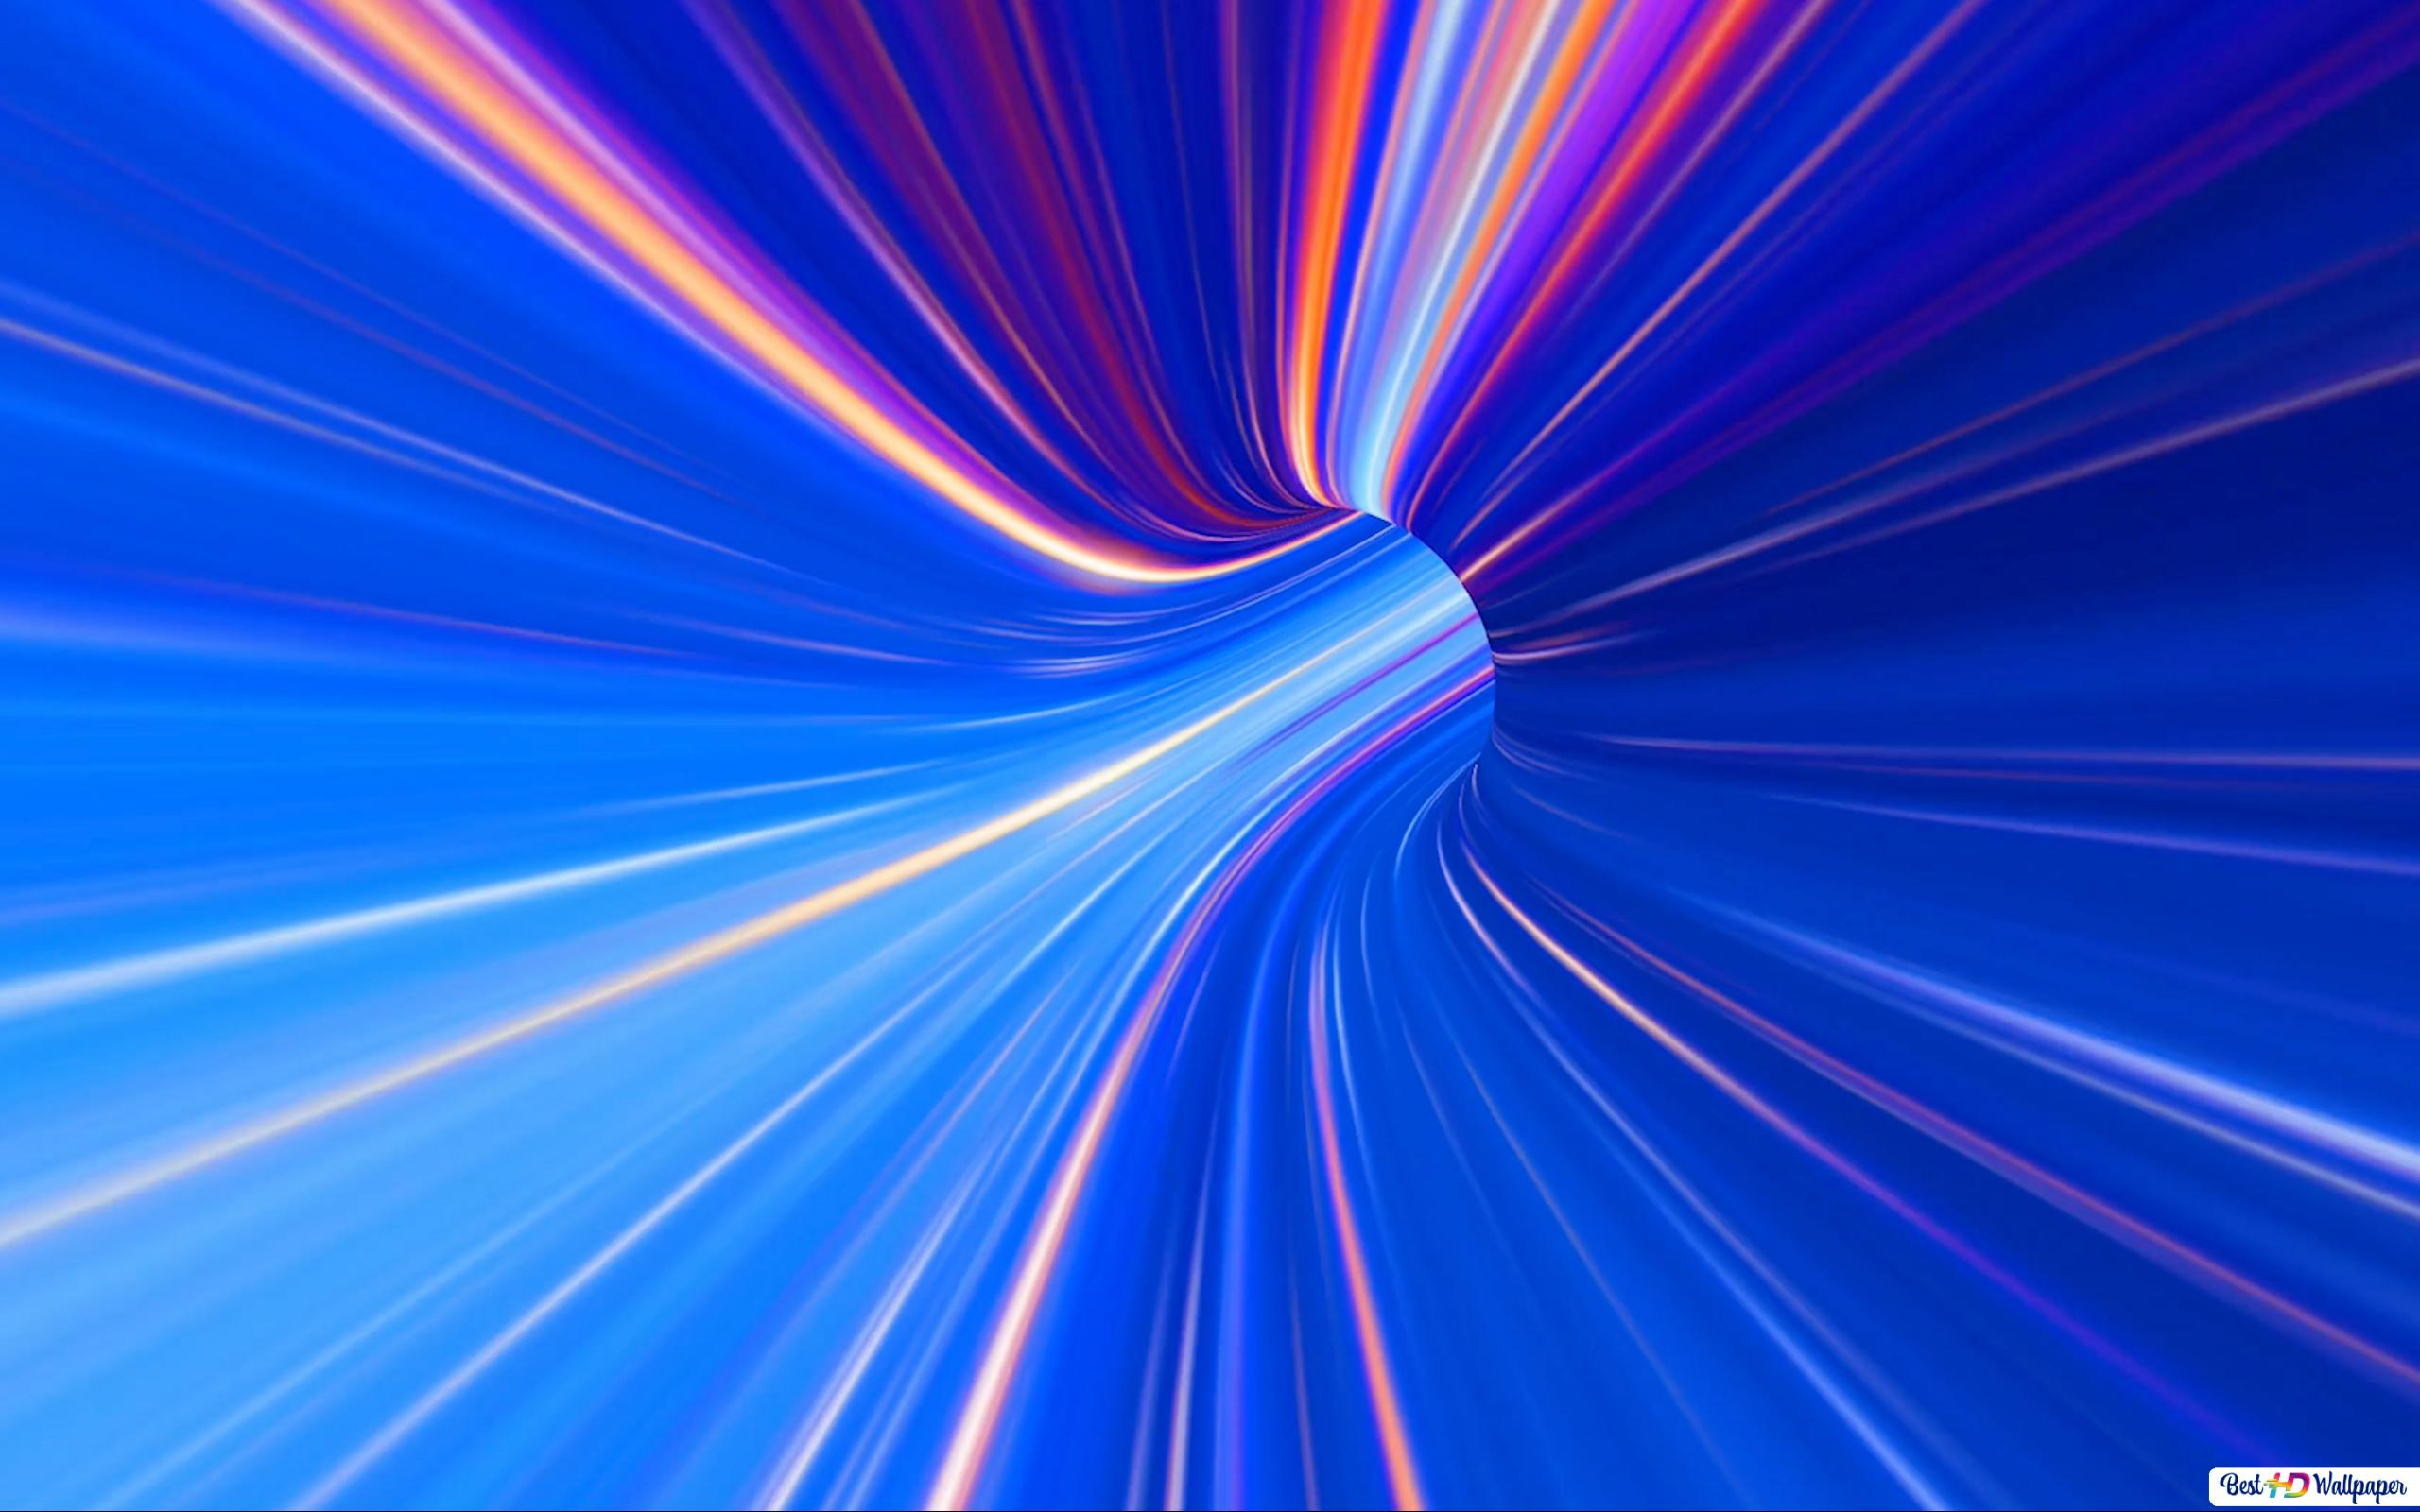 Blue Spectrum Tunnel Hd Wallpaper Download